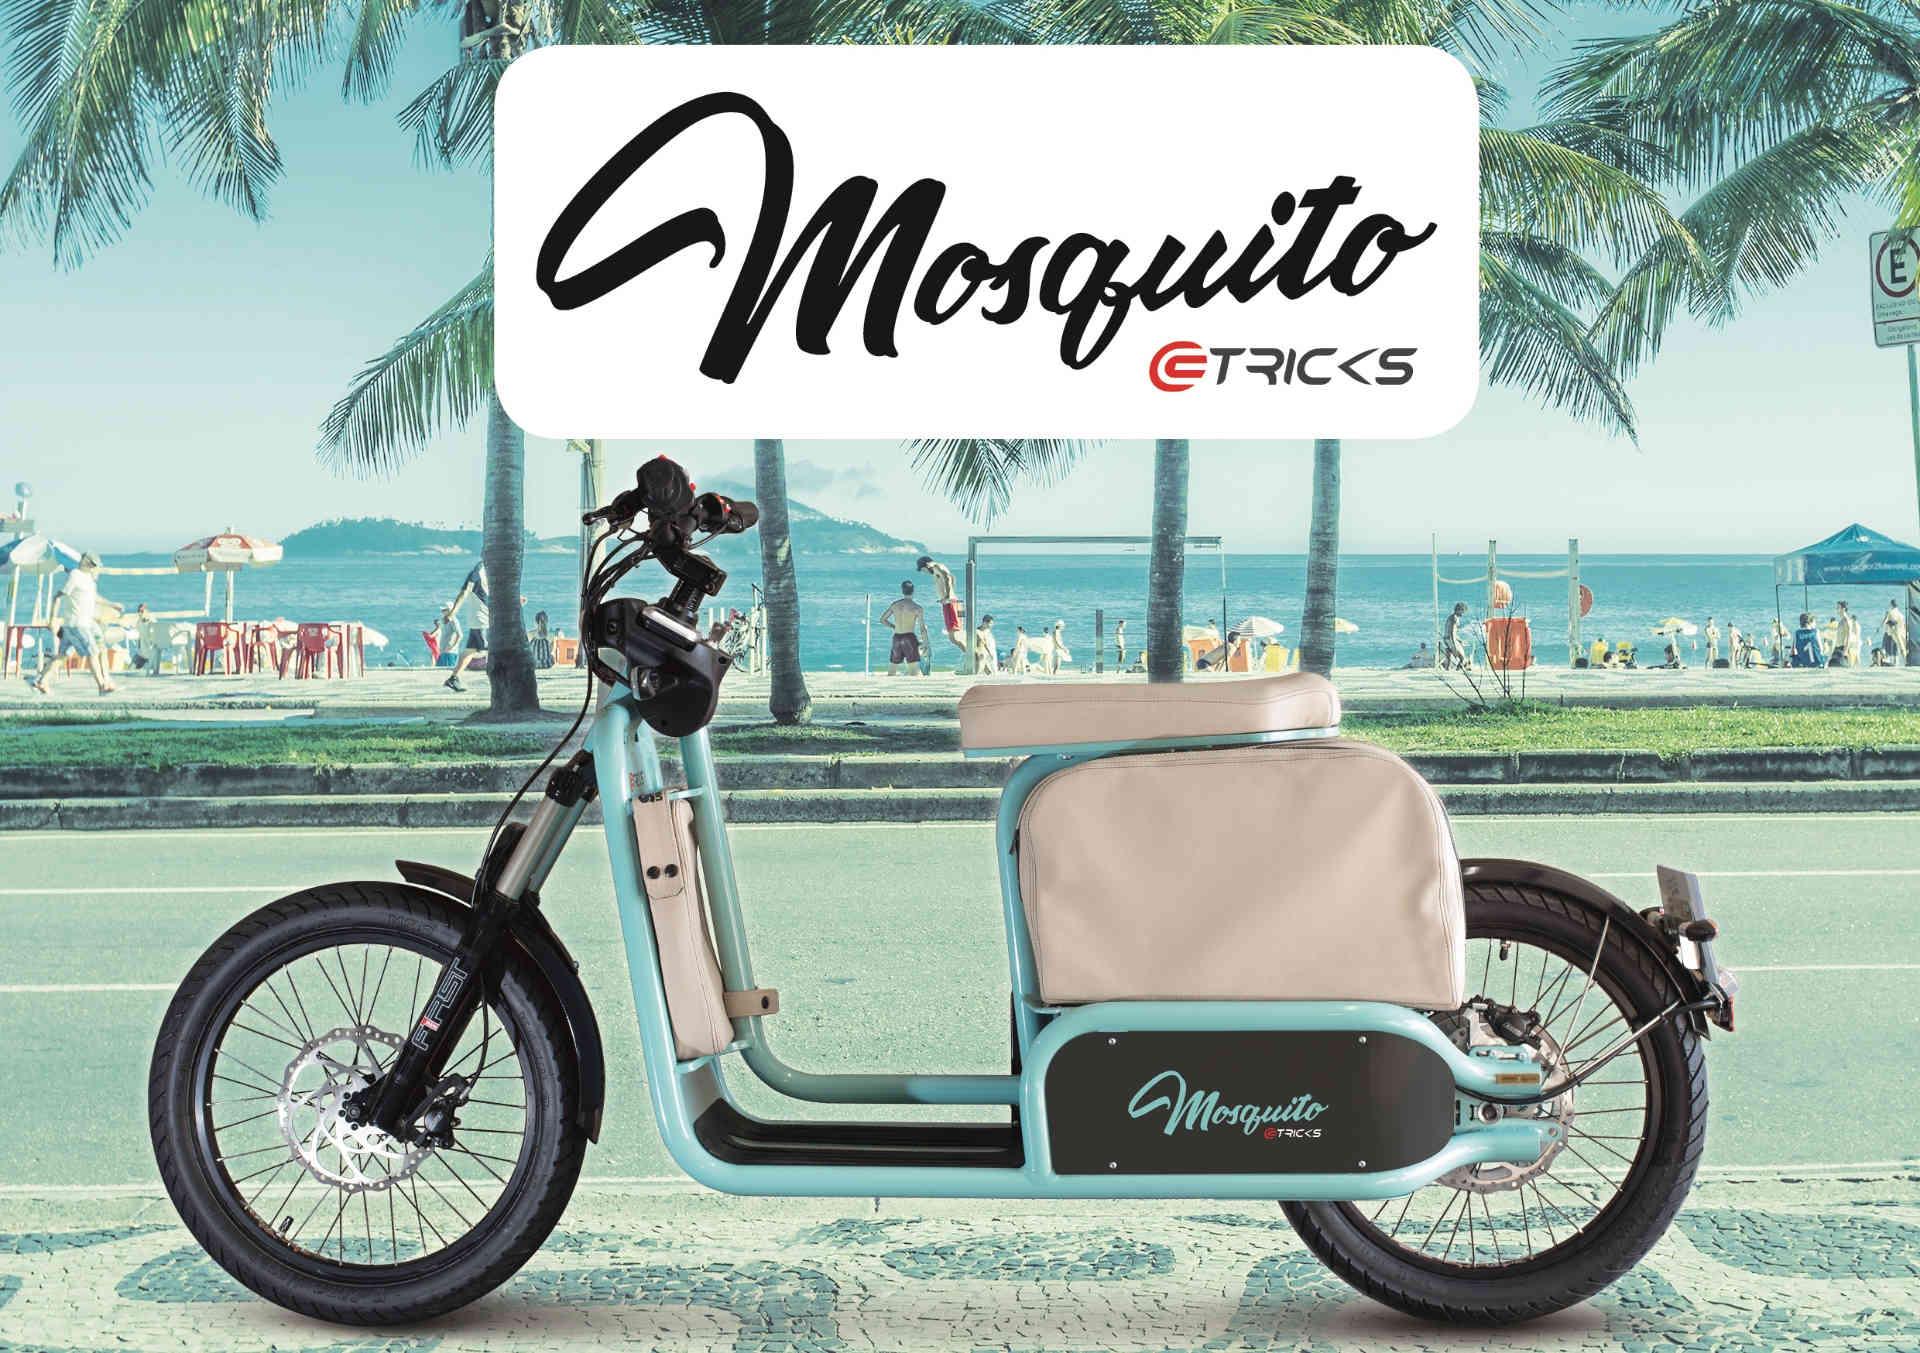 eTricks Mosquito